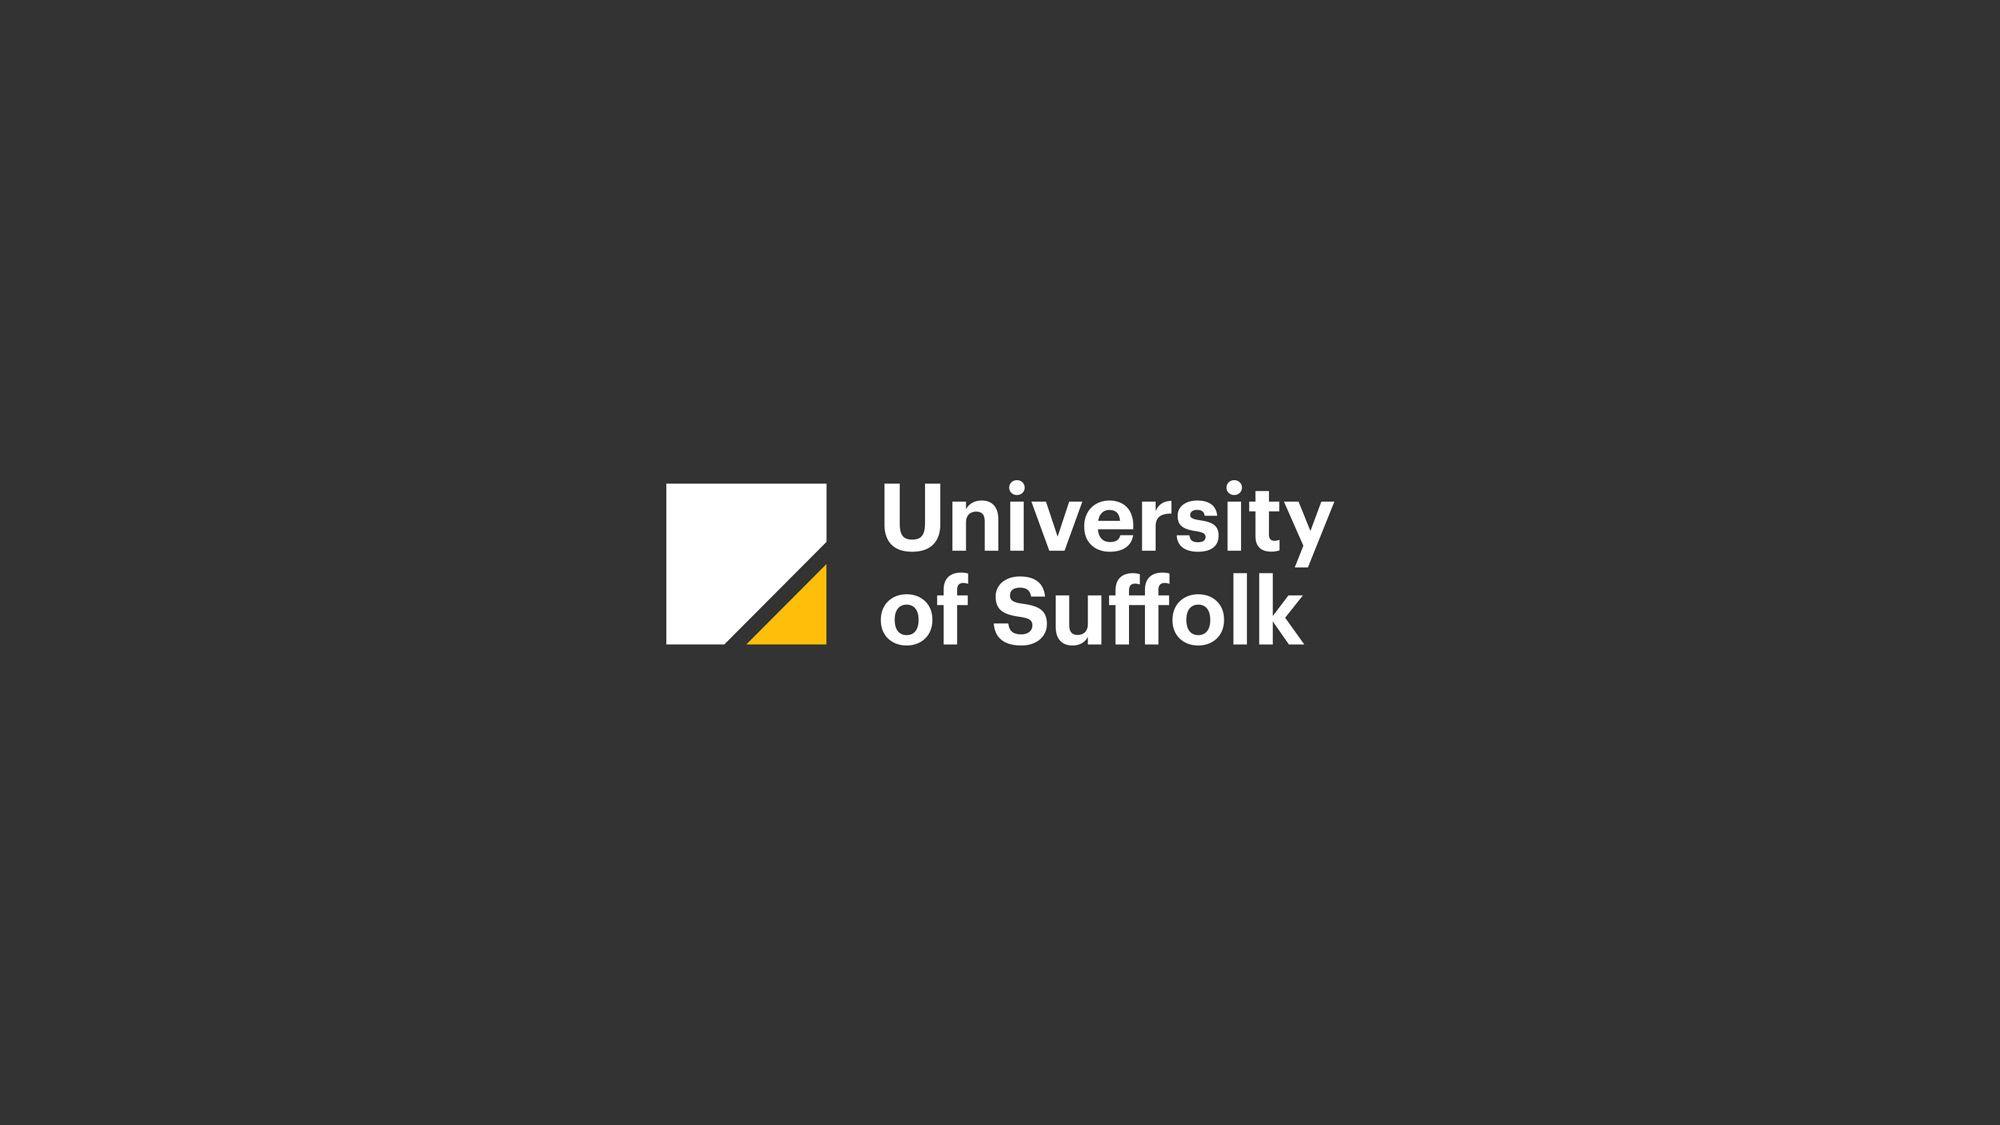 A brand identity for a new university university of